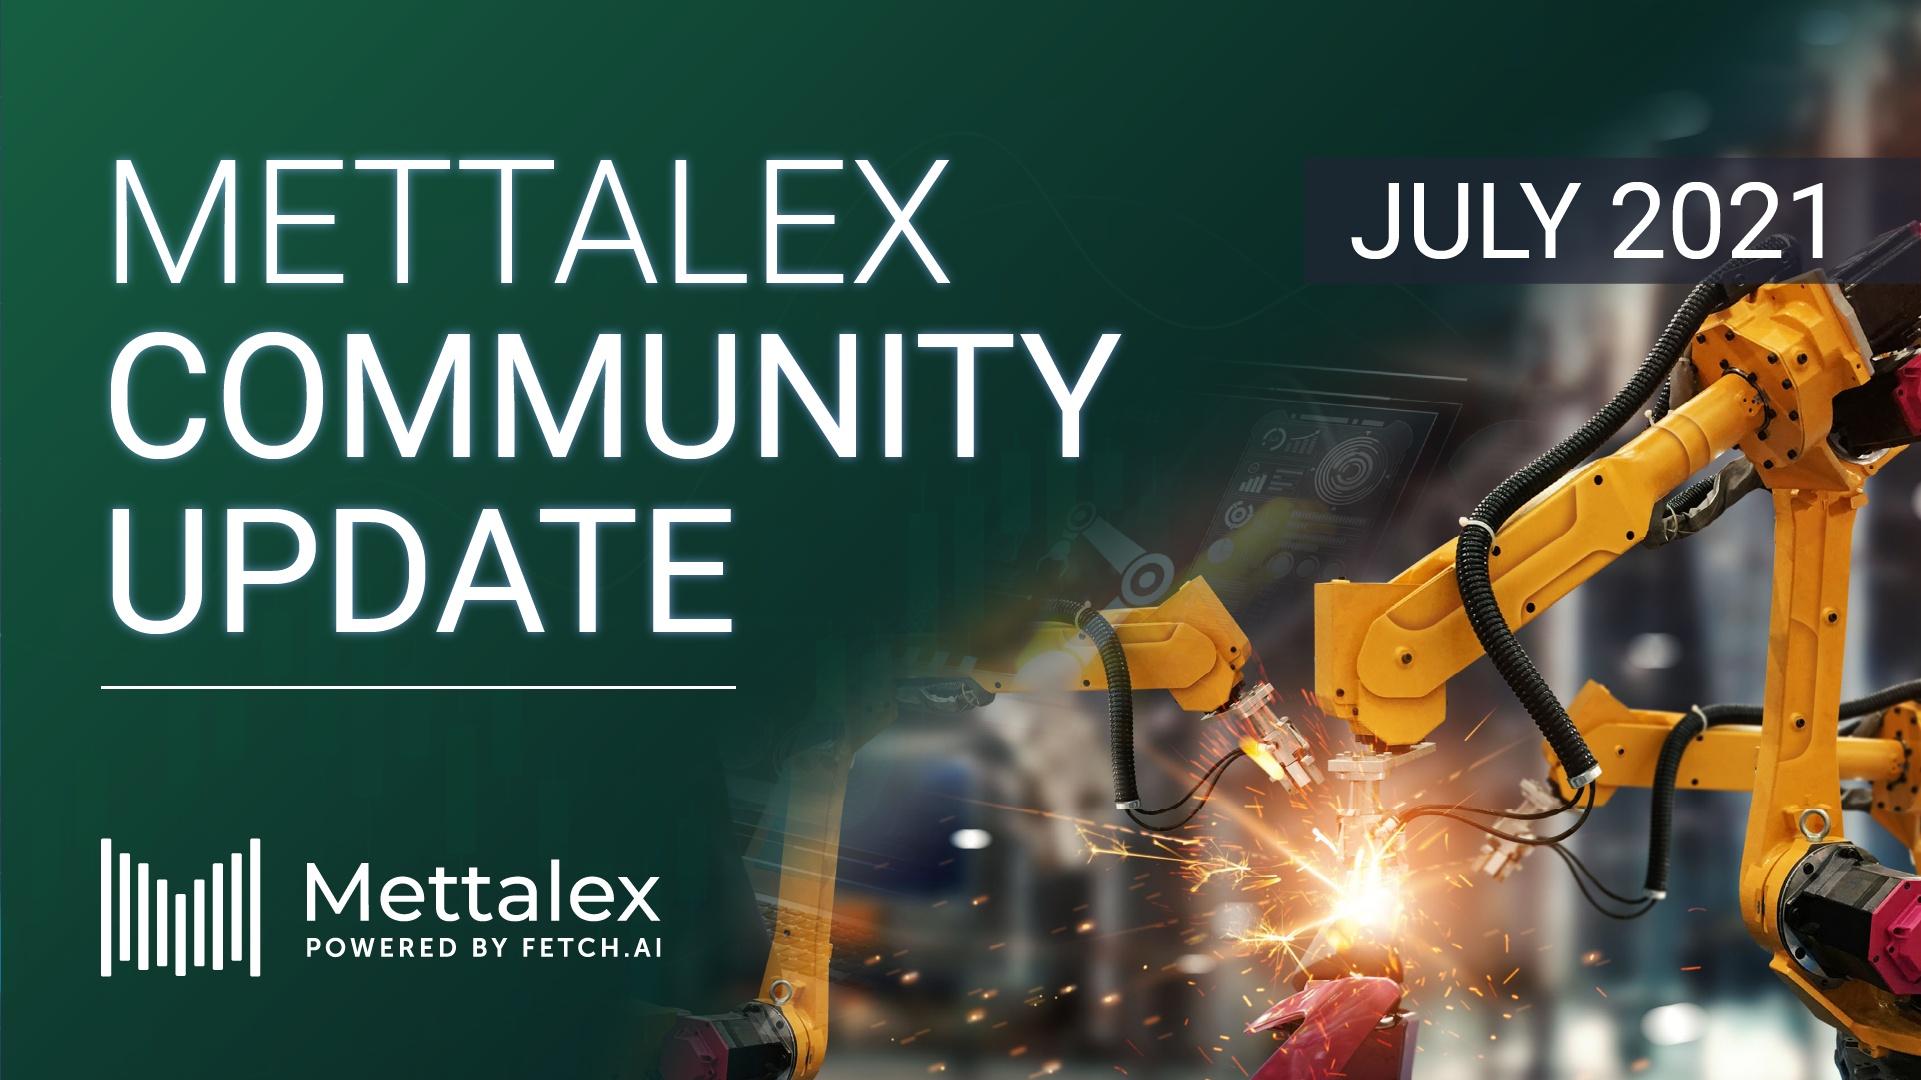 https://mettalex.com/wp-content/uploads/Mettalex-Community-Update-July-2021.jpg